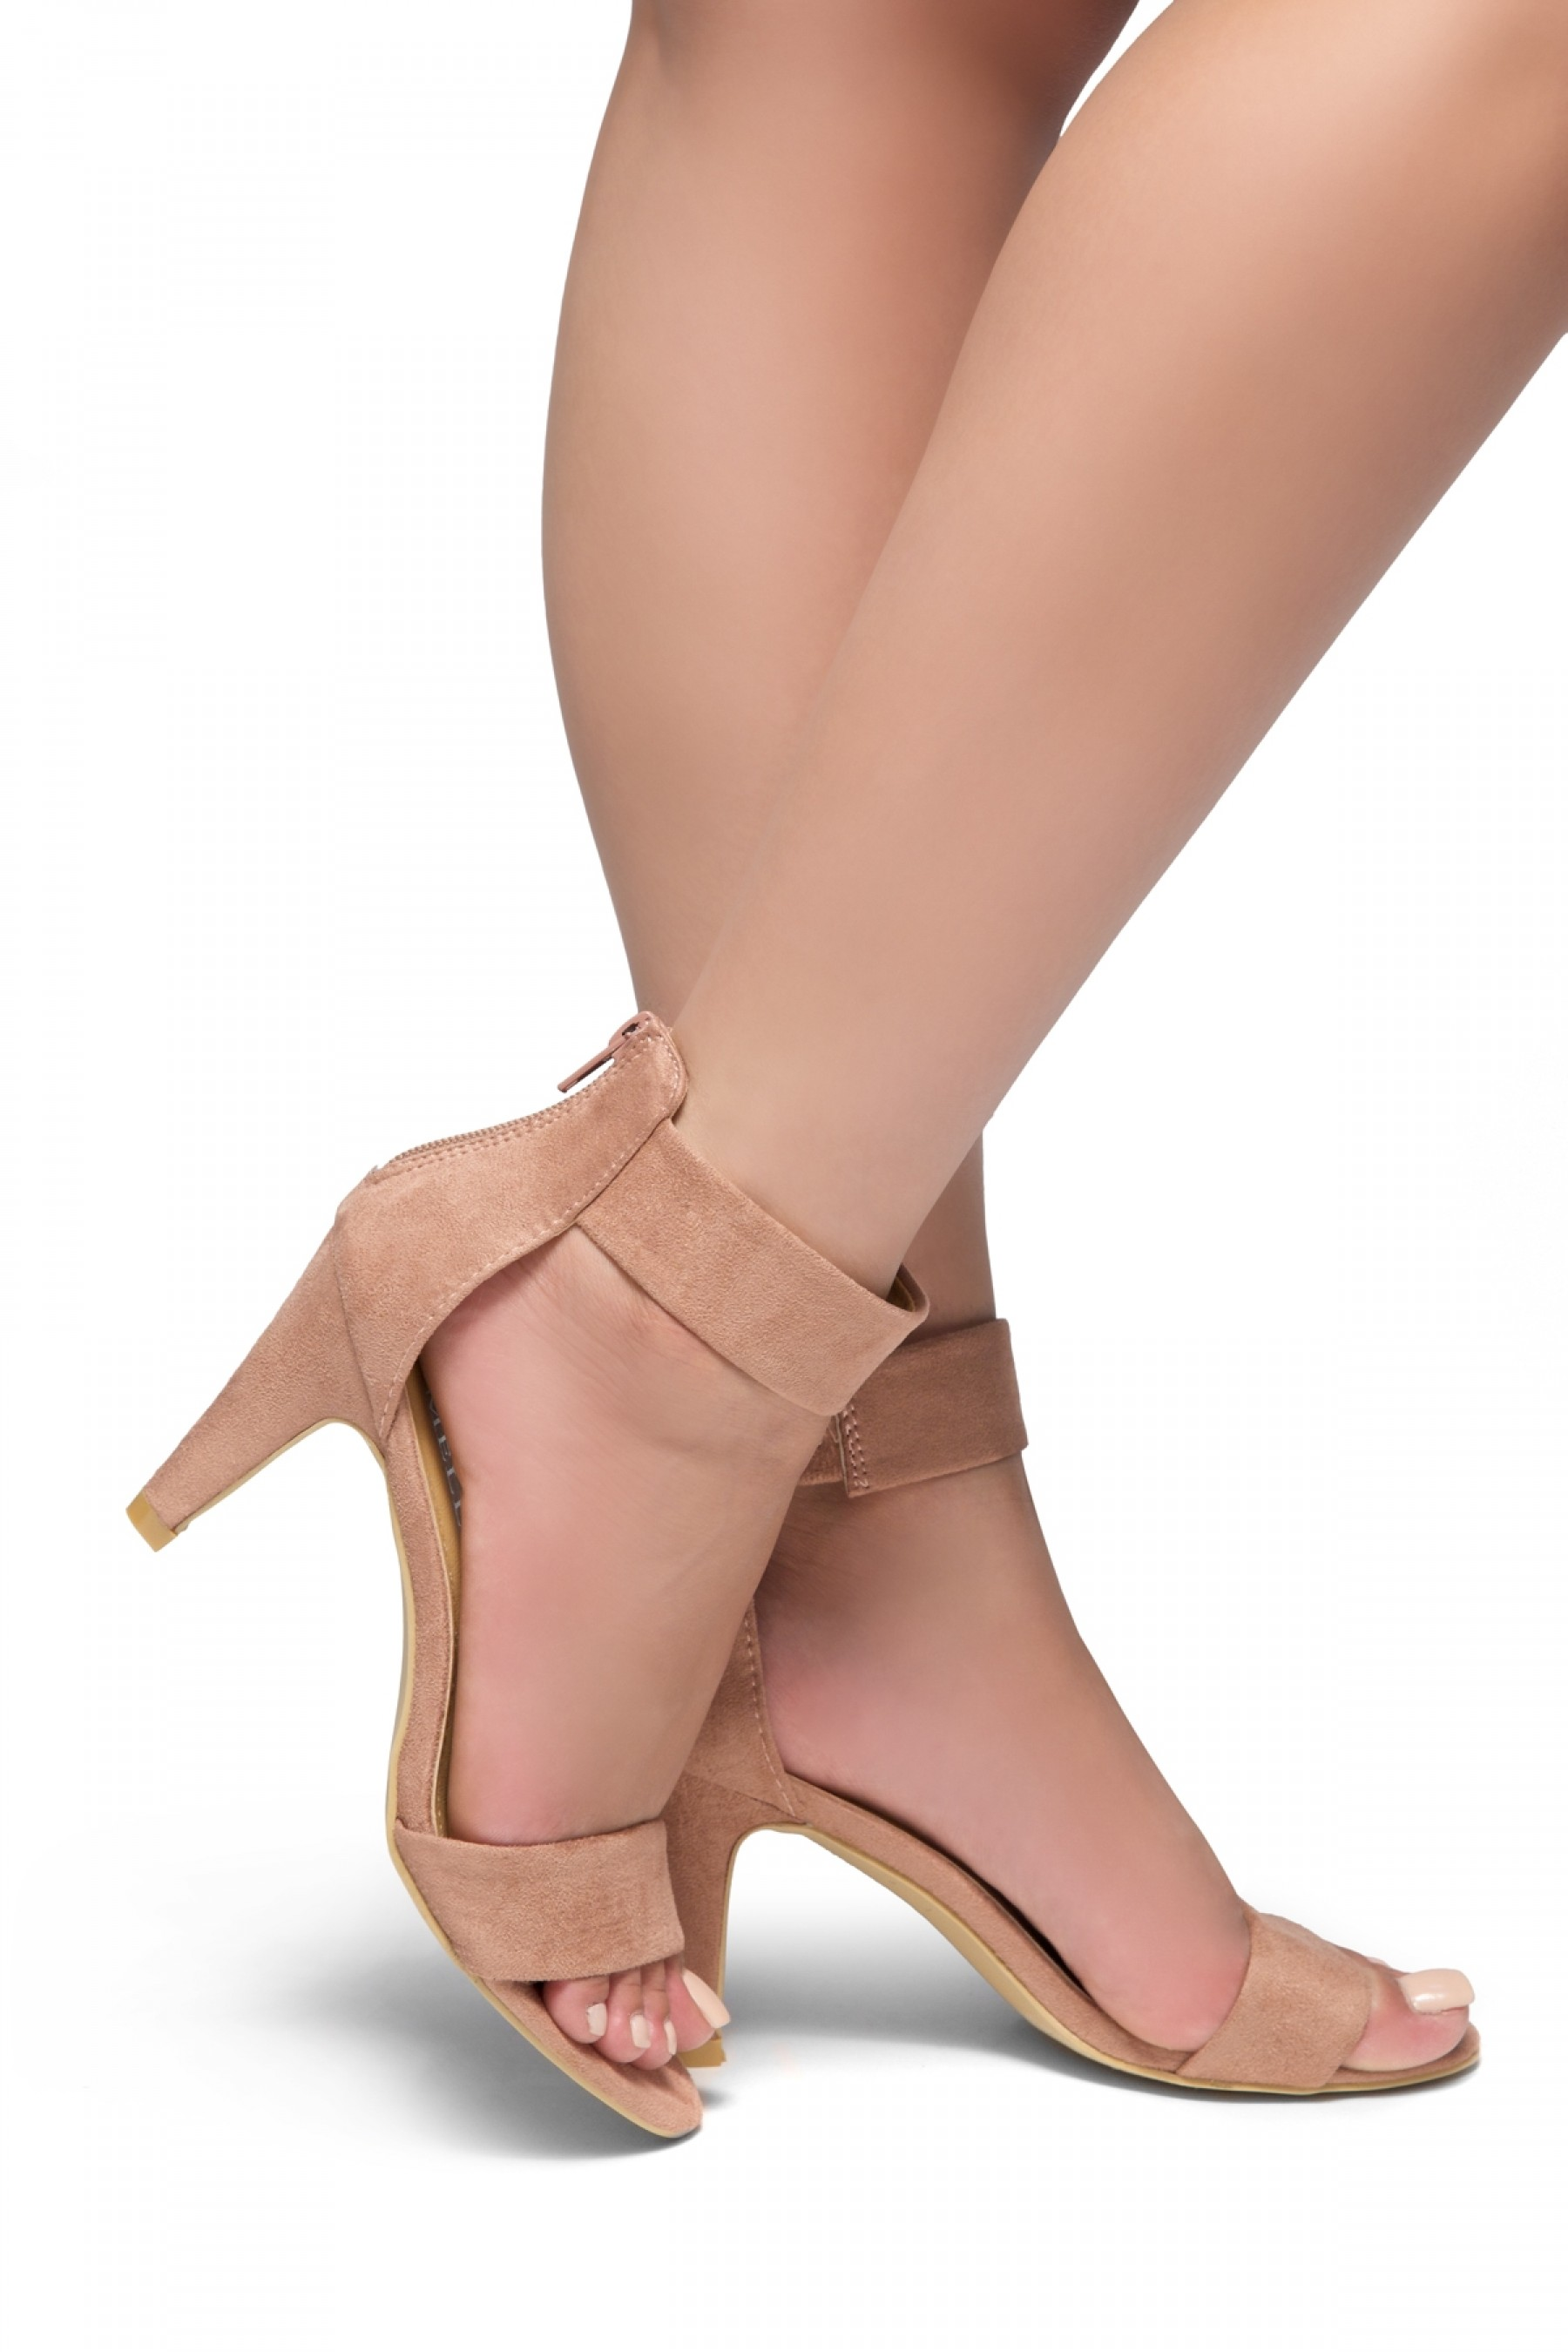 HerStyle RRose-Stiletto heel, back zipper closure (Mauve)